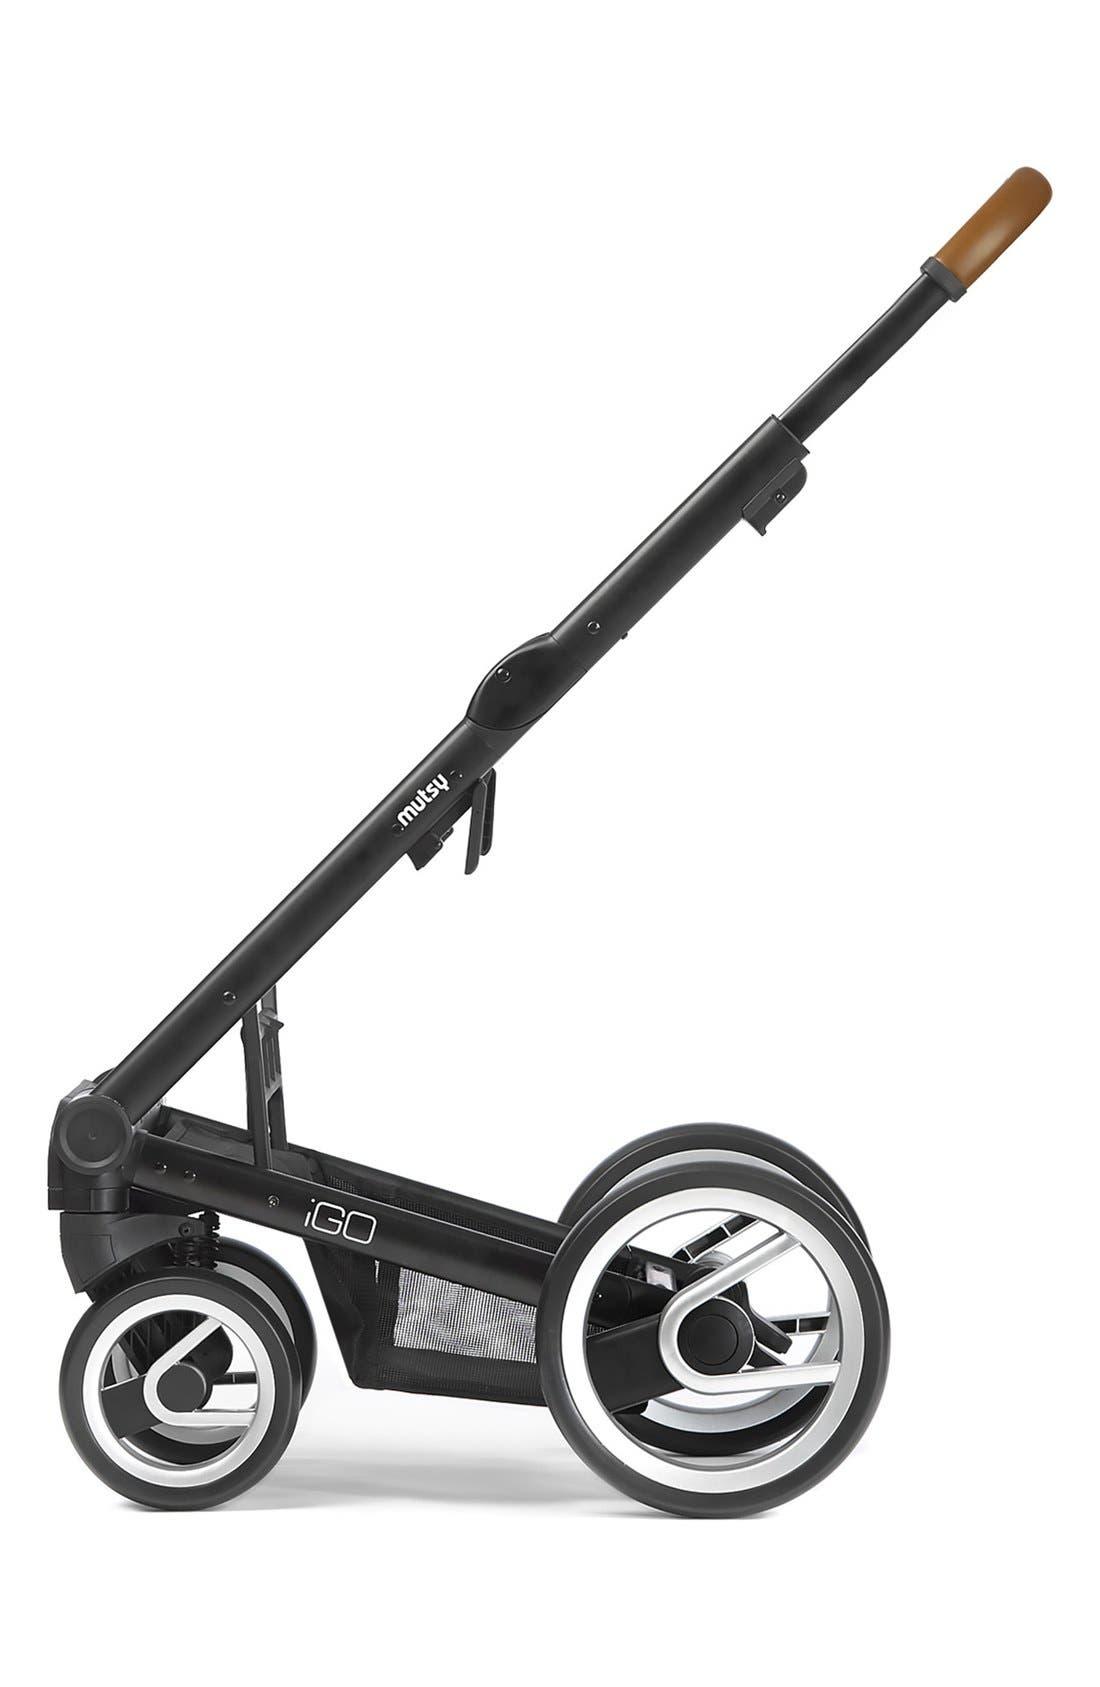 Igo - Urban Nomad Stroller,                             Alternate thumbnail 5, color,                             Black/ White/ Blue